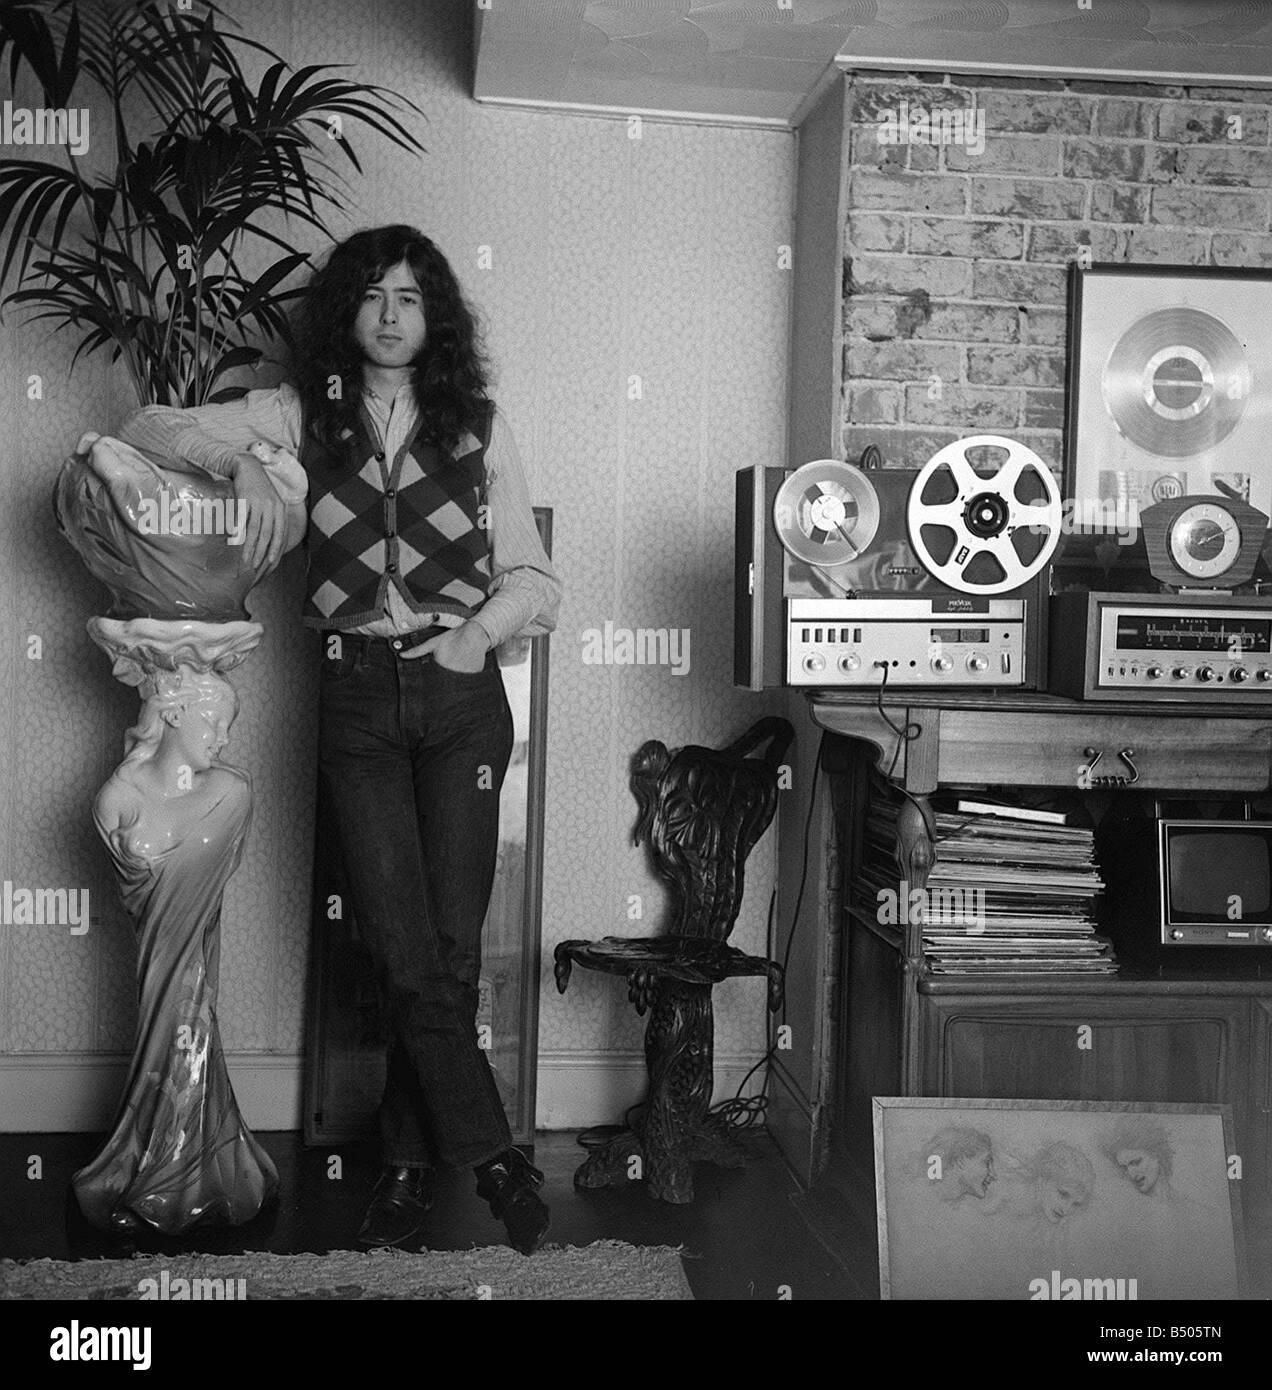 Jimmy Page Led Zeppelin guitarist January1970 Stock Photo